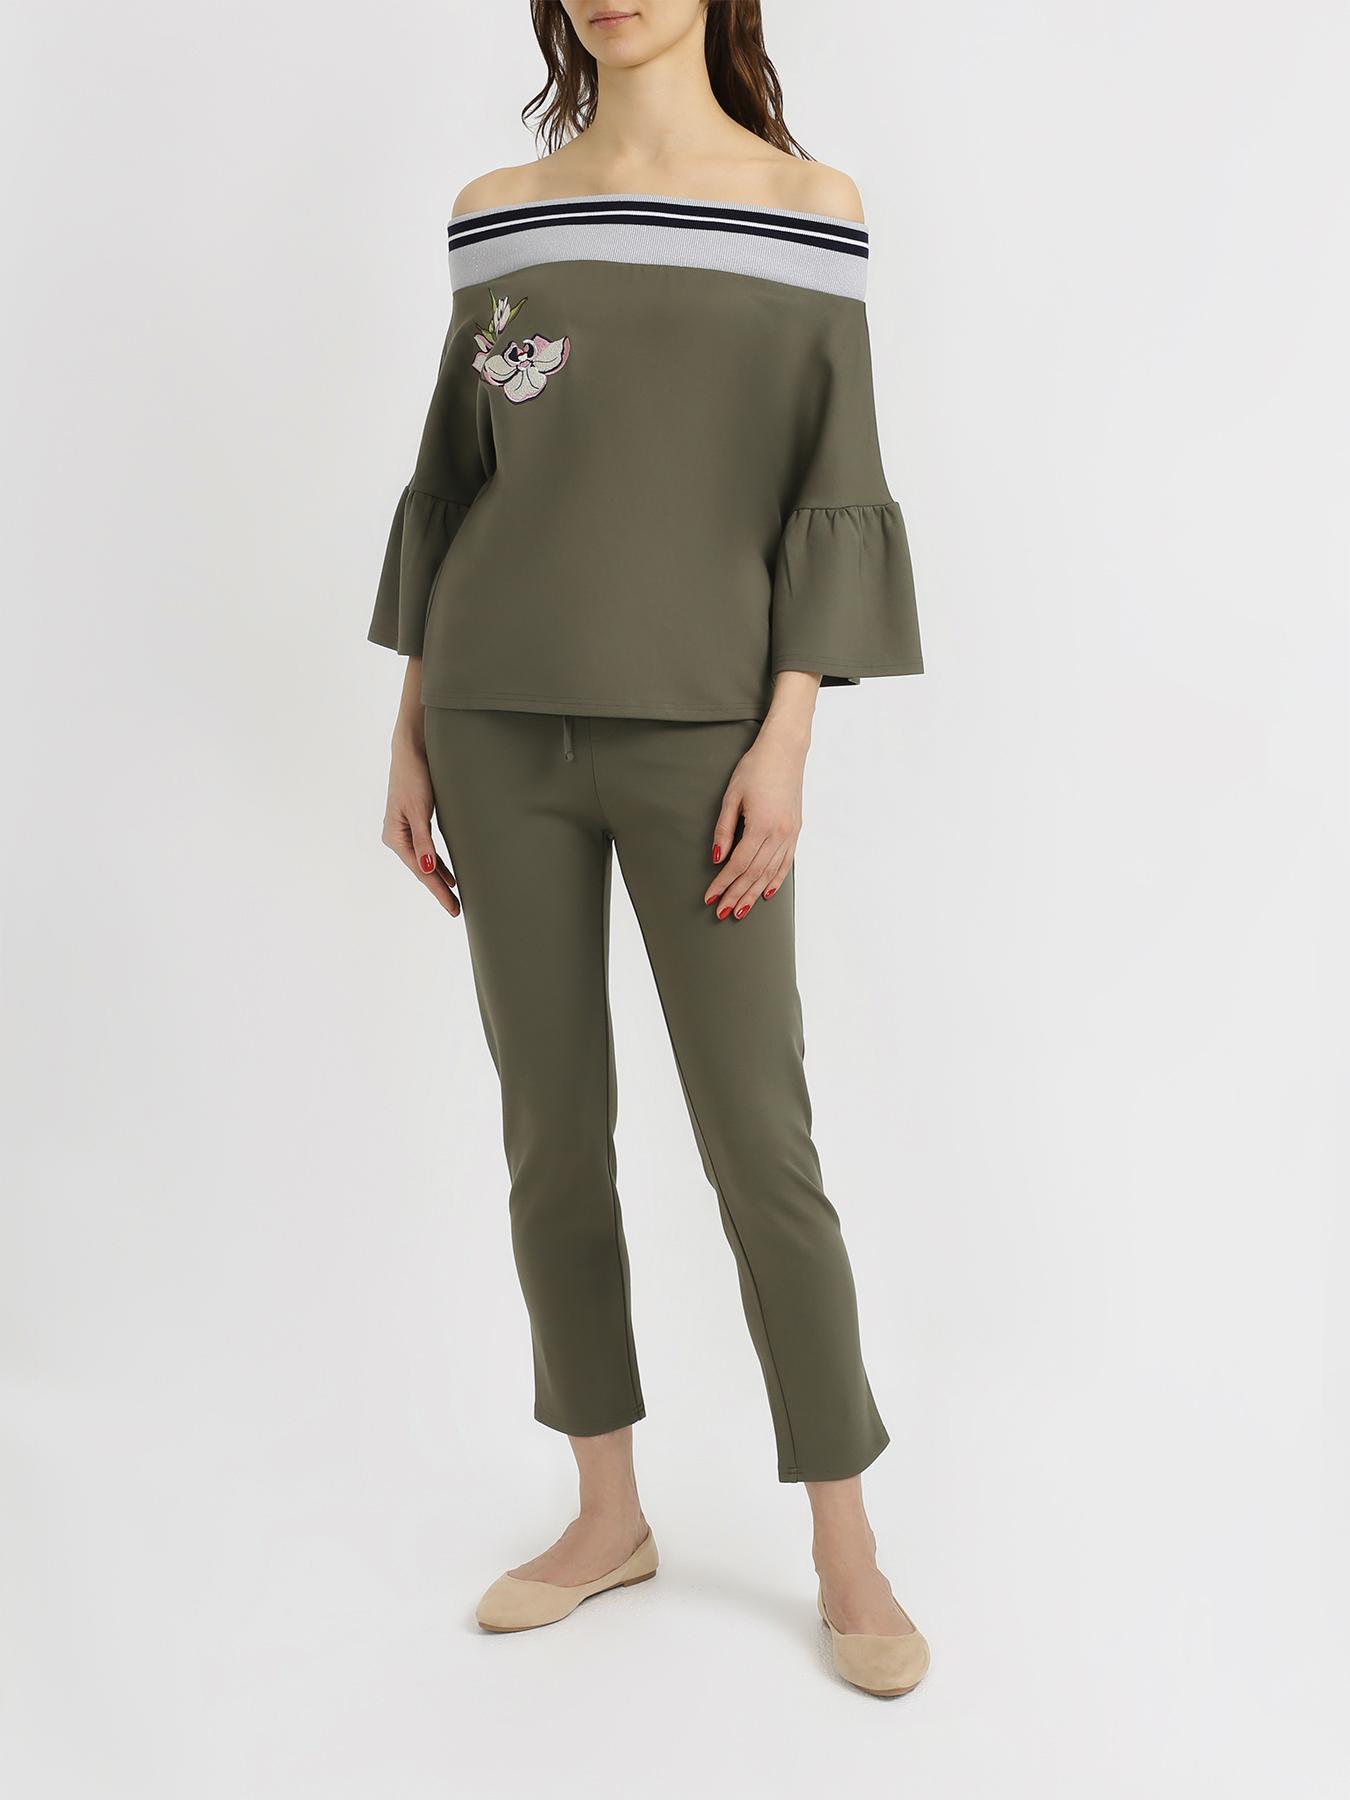 Блузка 6 P.M. Женская блузка